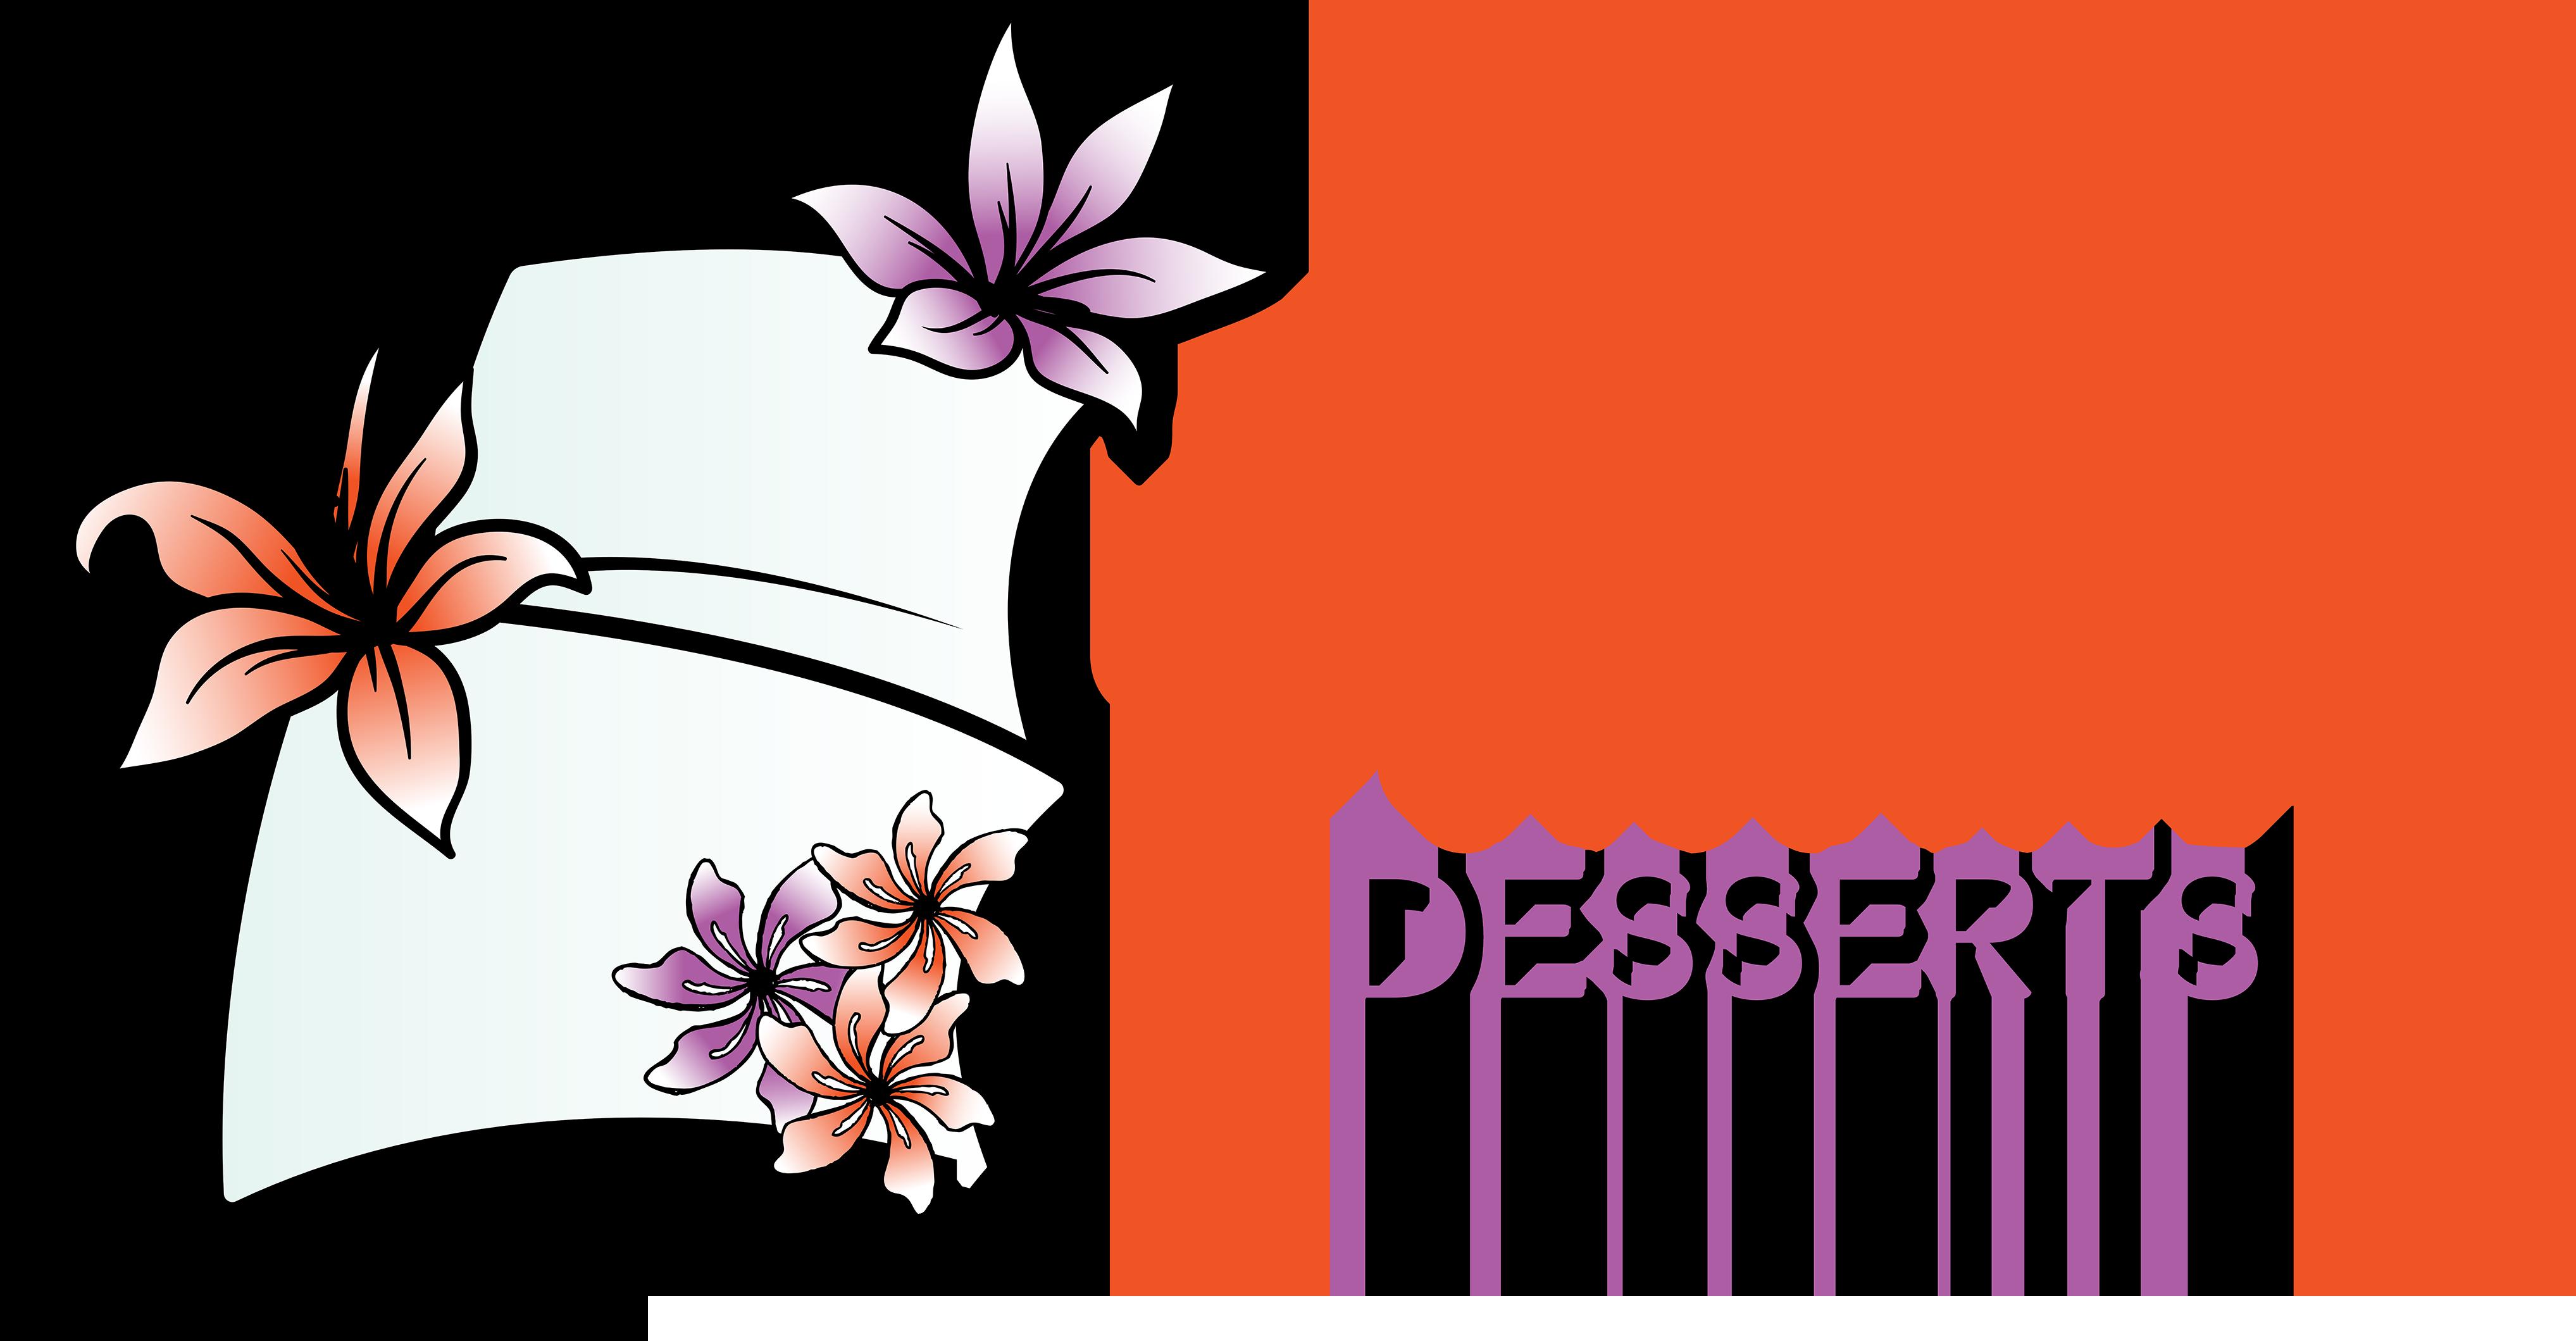 Desserts clipart dessert table. Wedding cakes in virginia